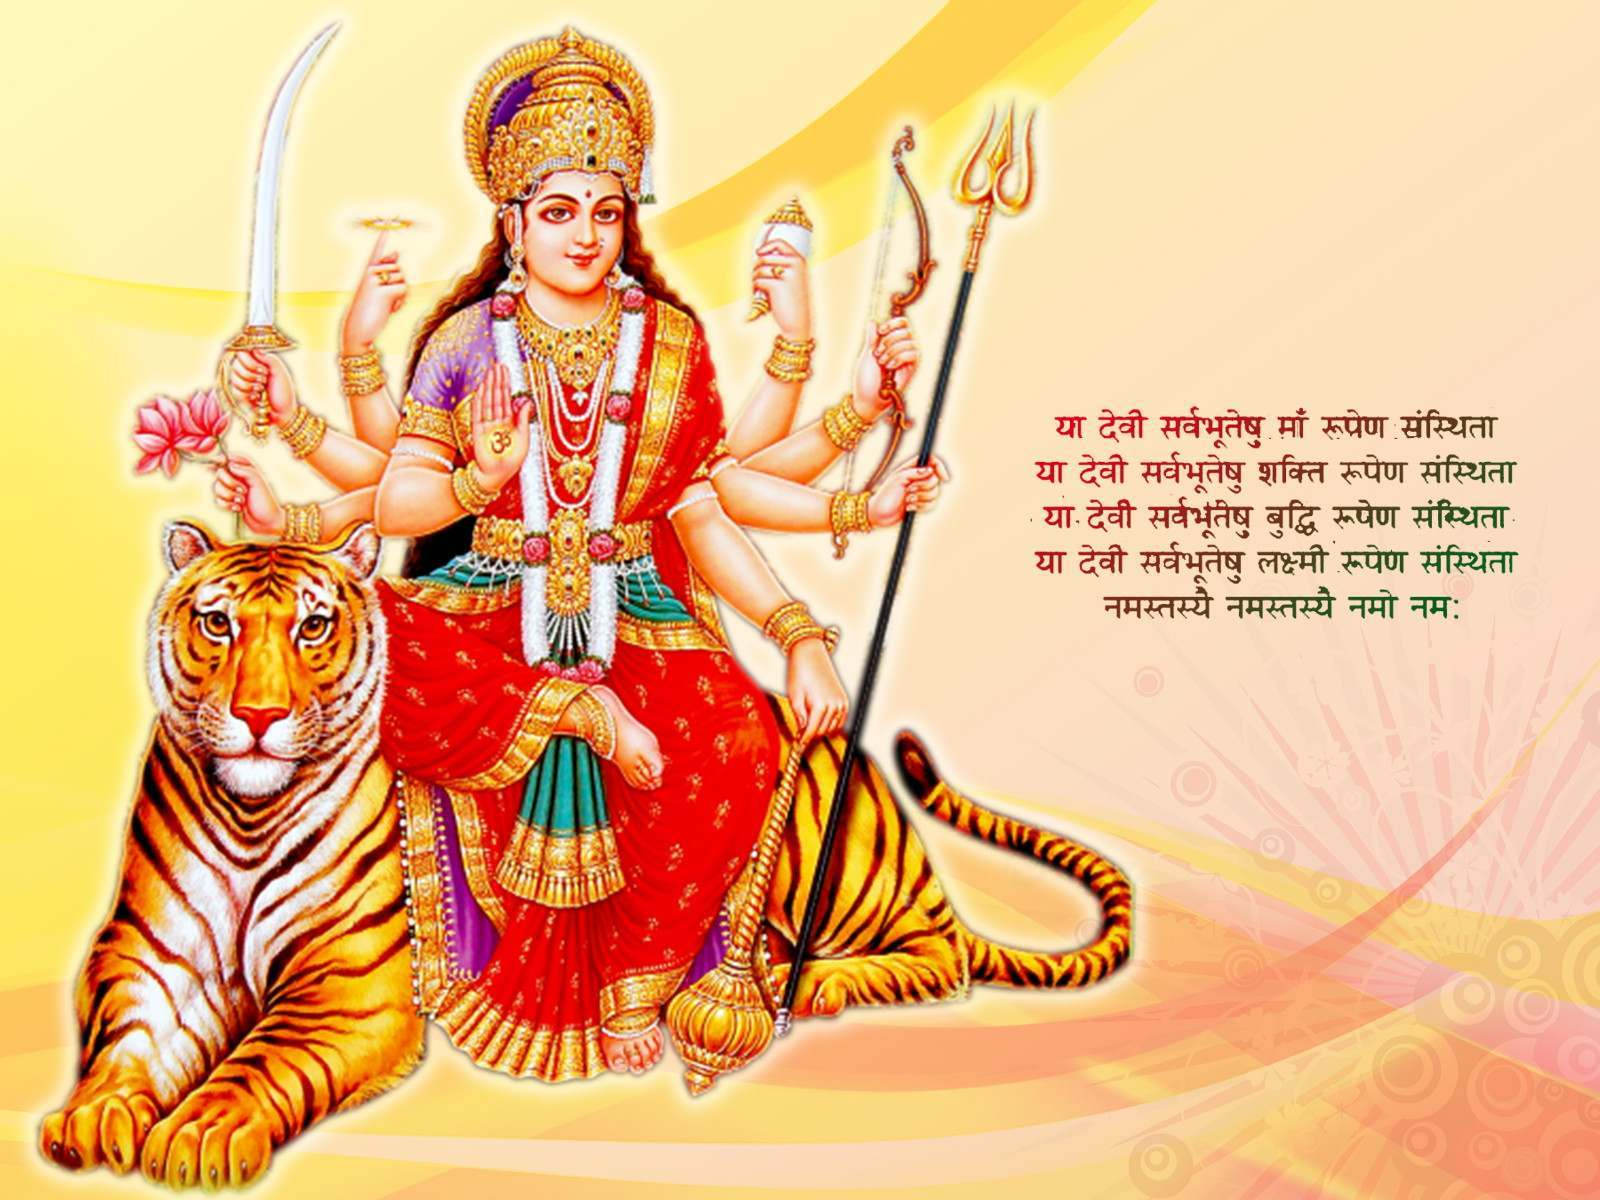 Beautiful Image of Maa Durga